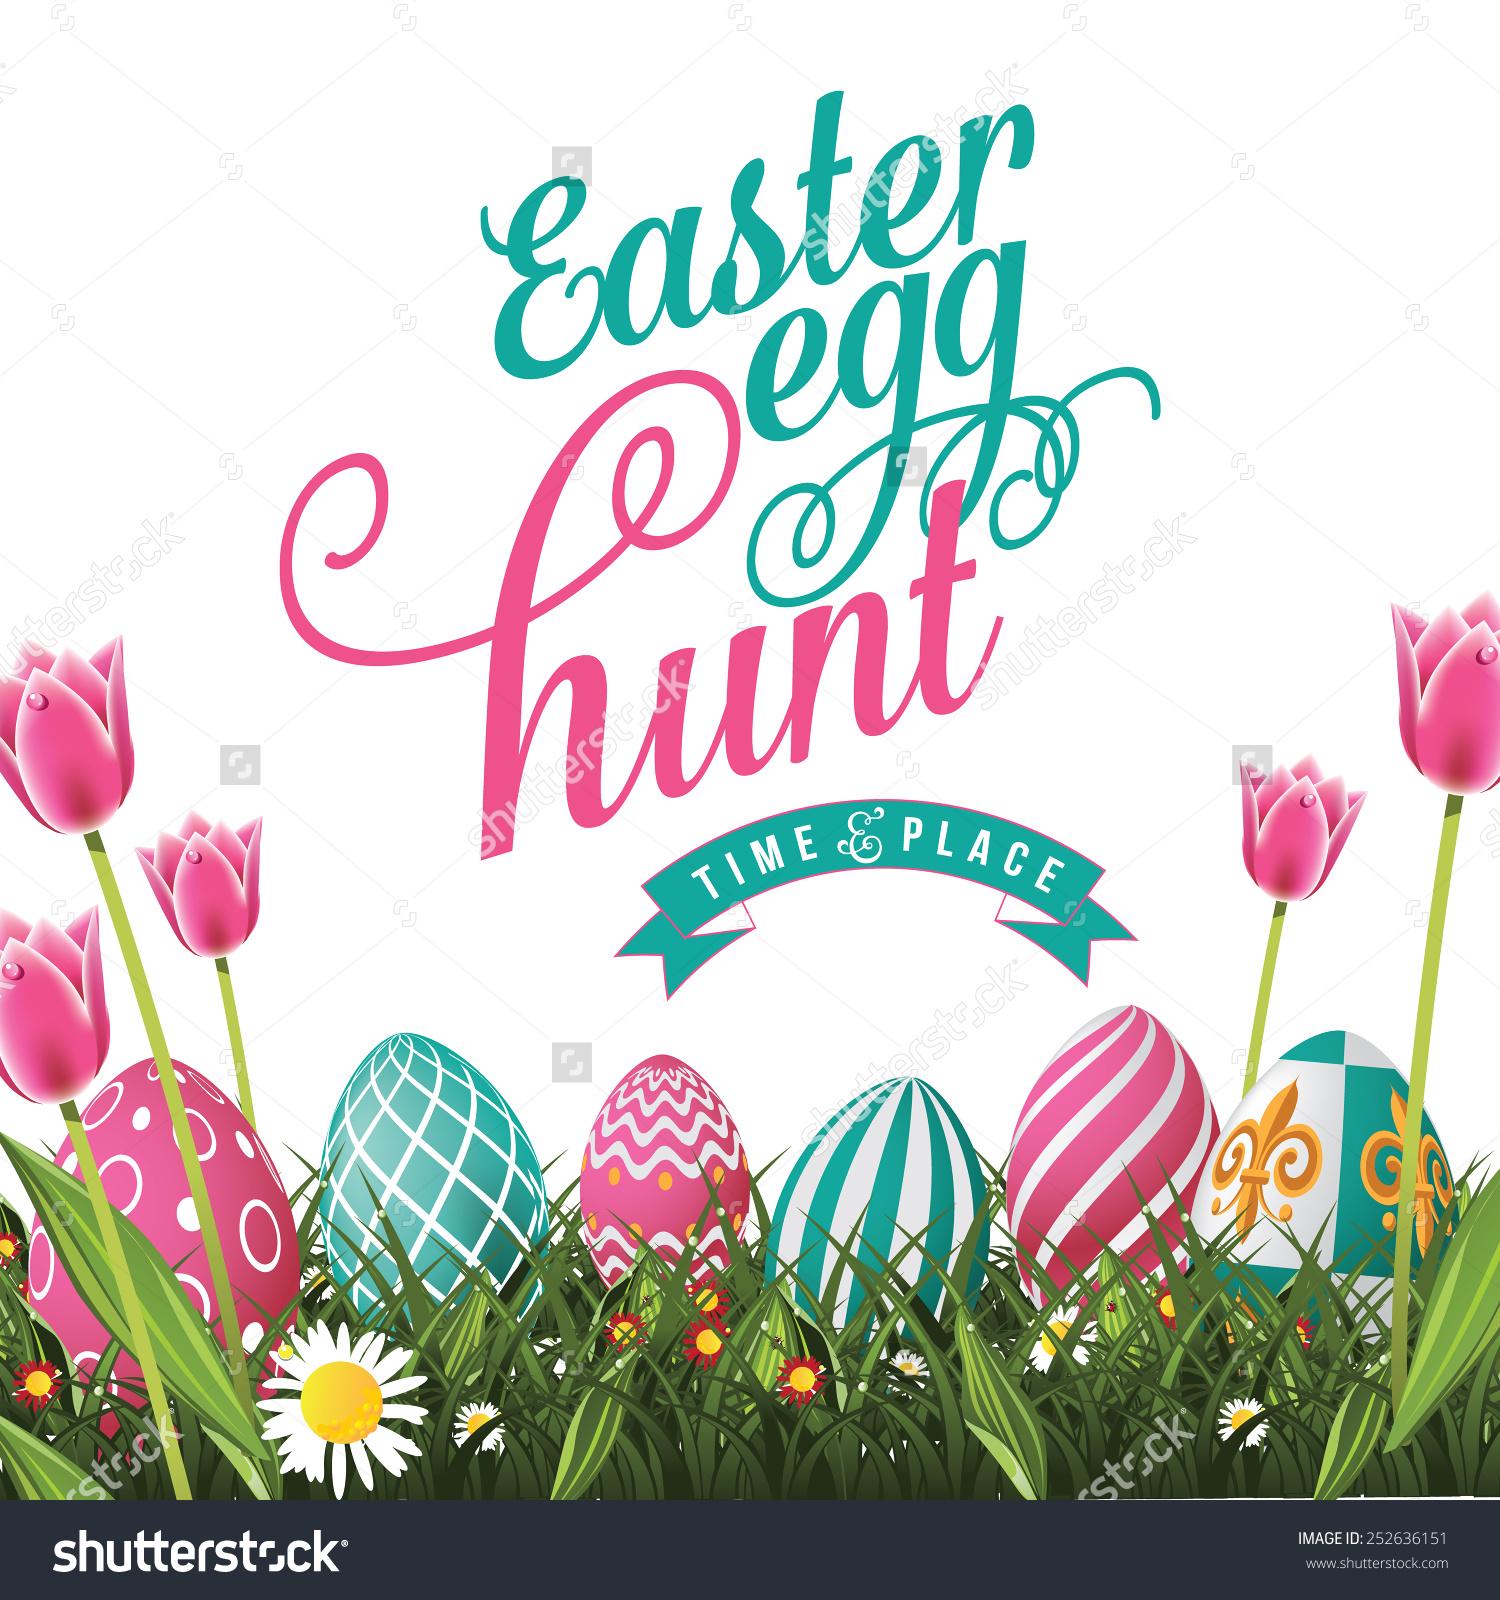 Easter egg hunt clipart free clip art free library Easter Egg Hunt Sign Free Clip Art – Clipart Free Download clip art free library